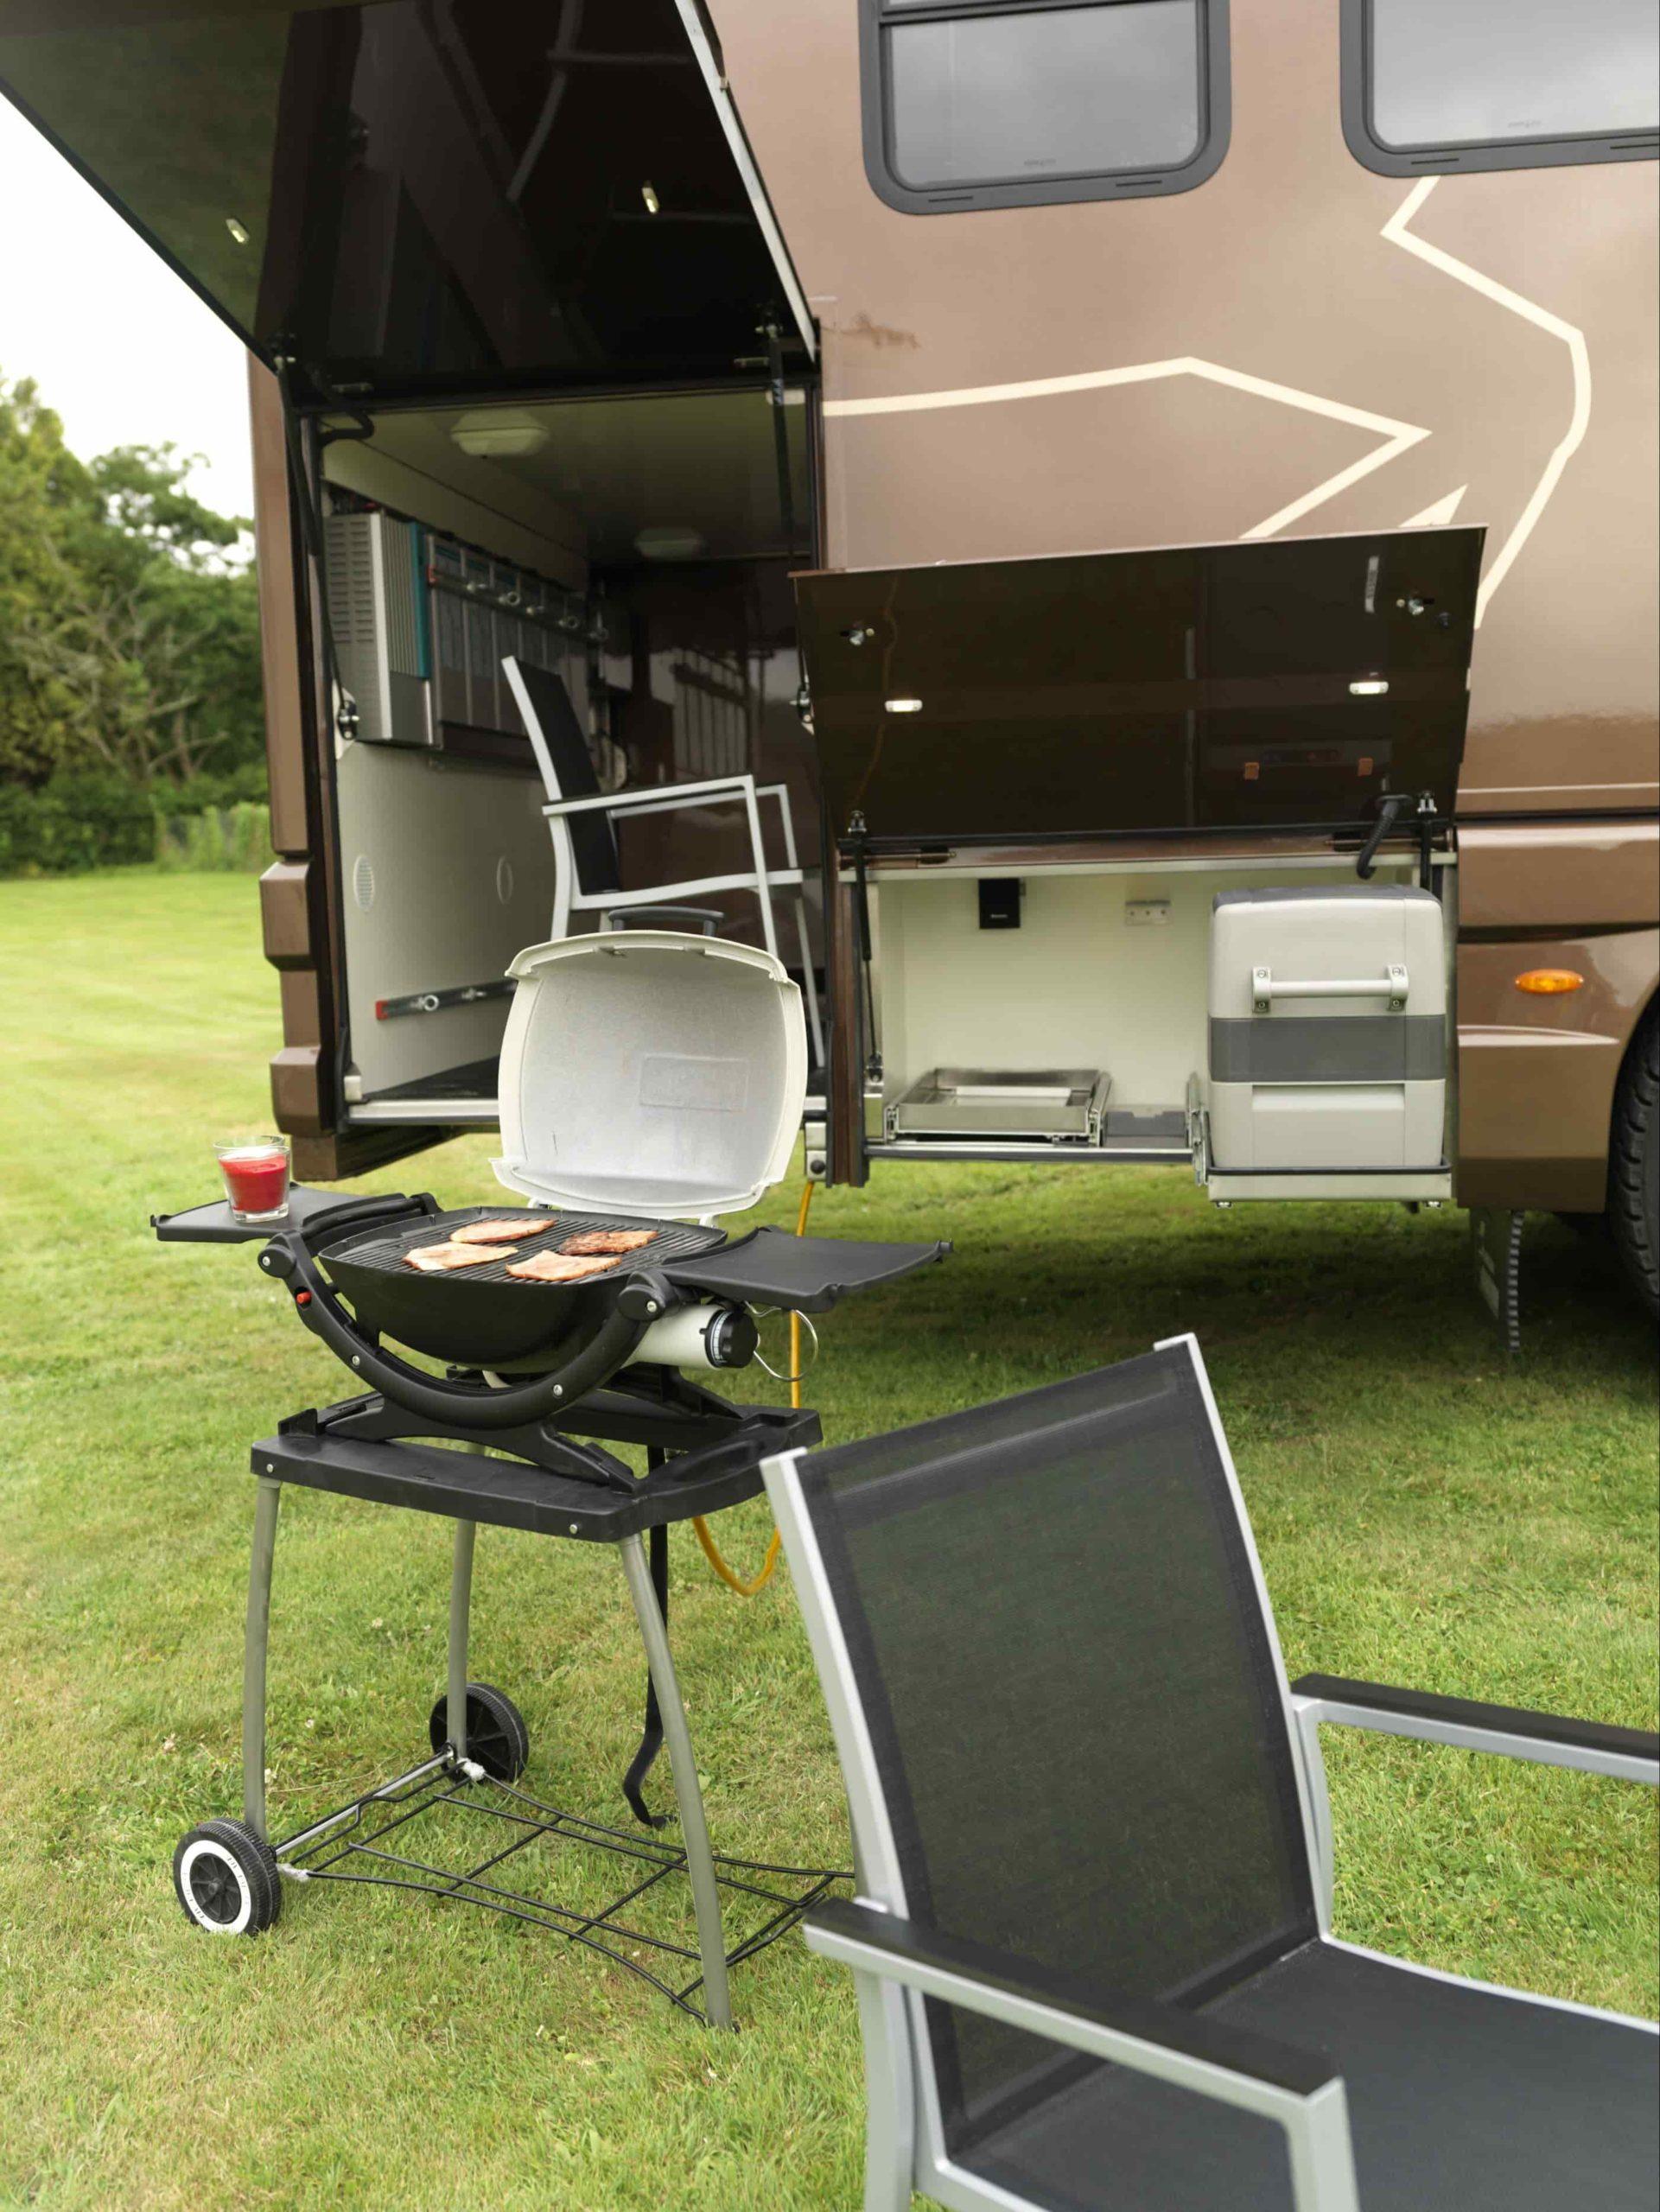 Vans Chardron camping cars haut de gamme